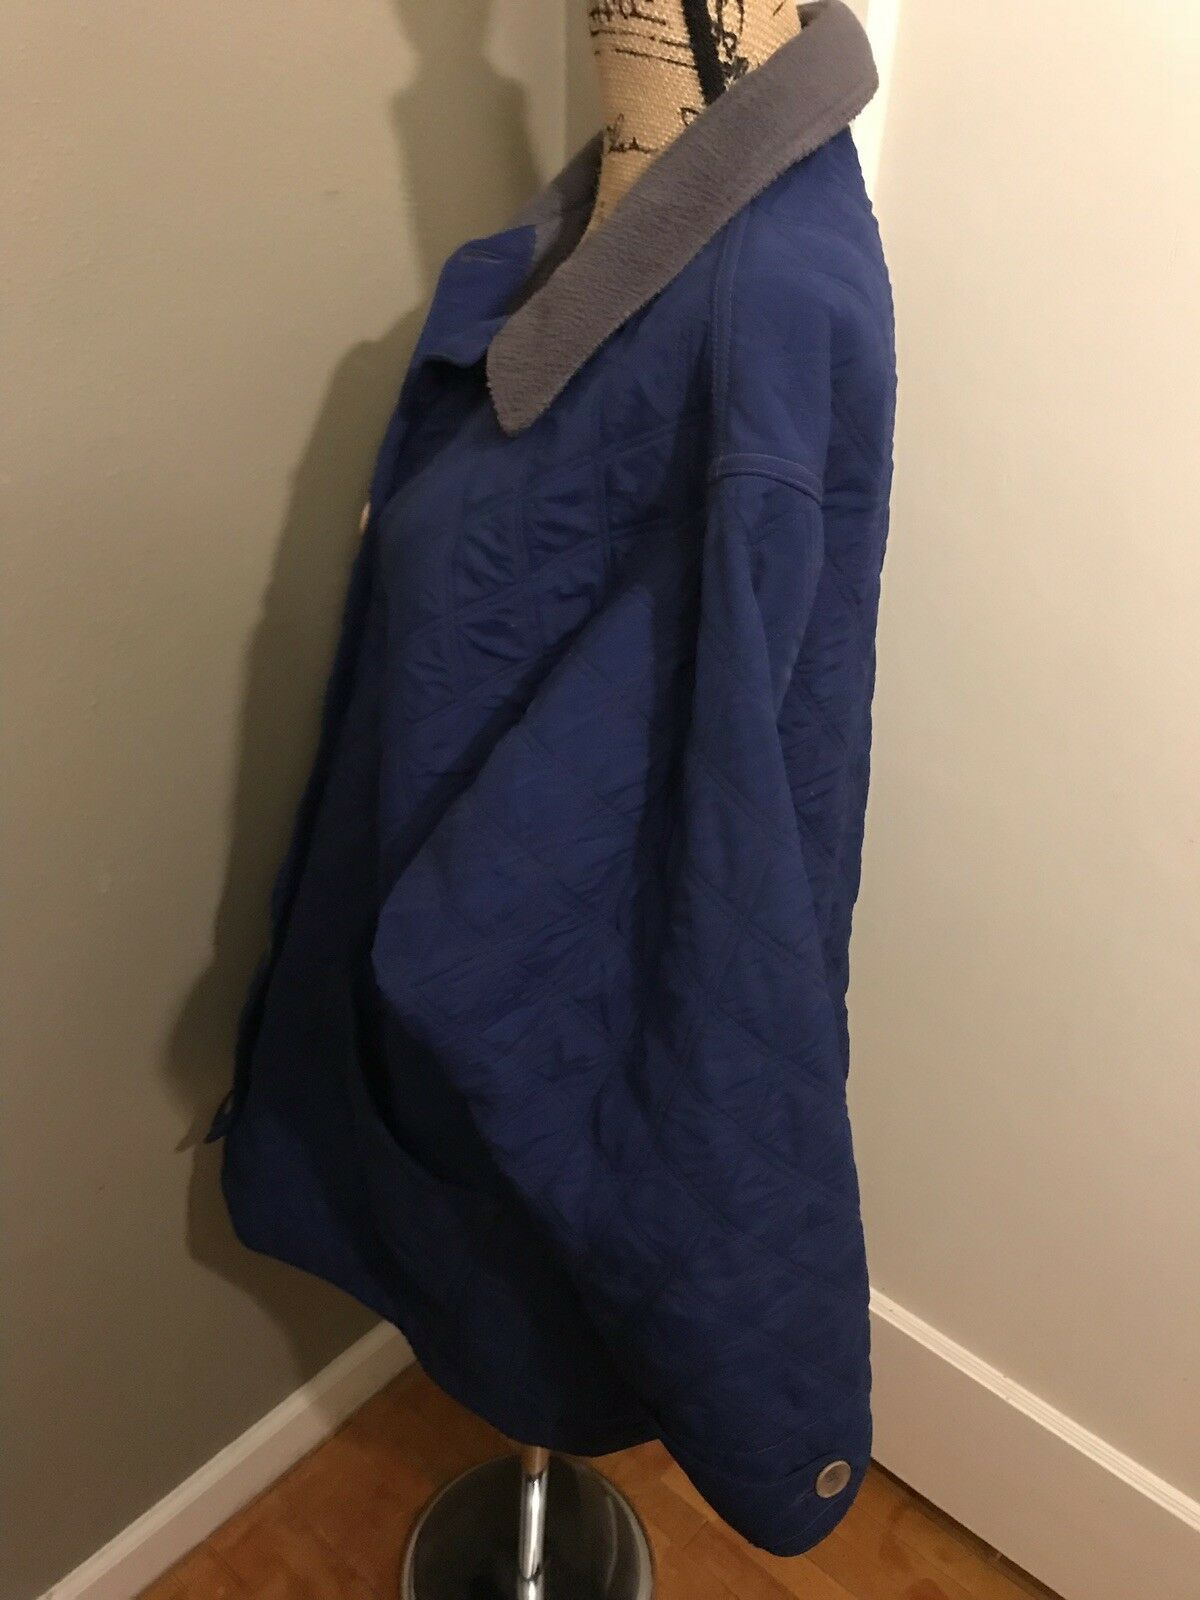 PATAGONIA Women's Vintage bluee Quilted Button Down Long Coat Coat Coat Size 14 438d9d